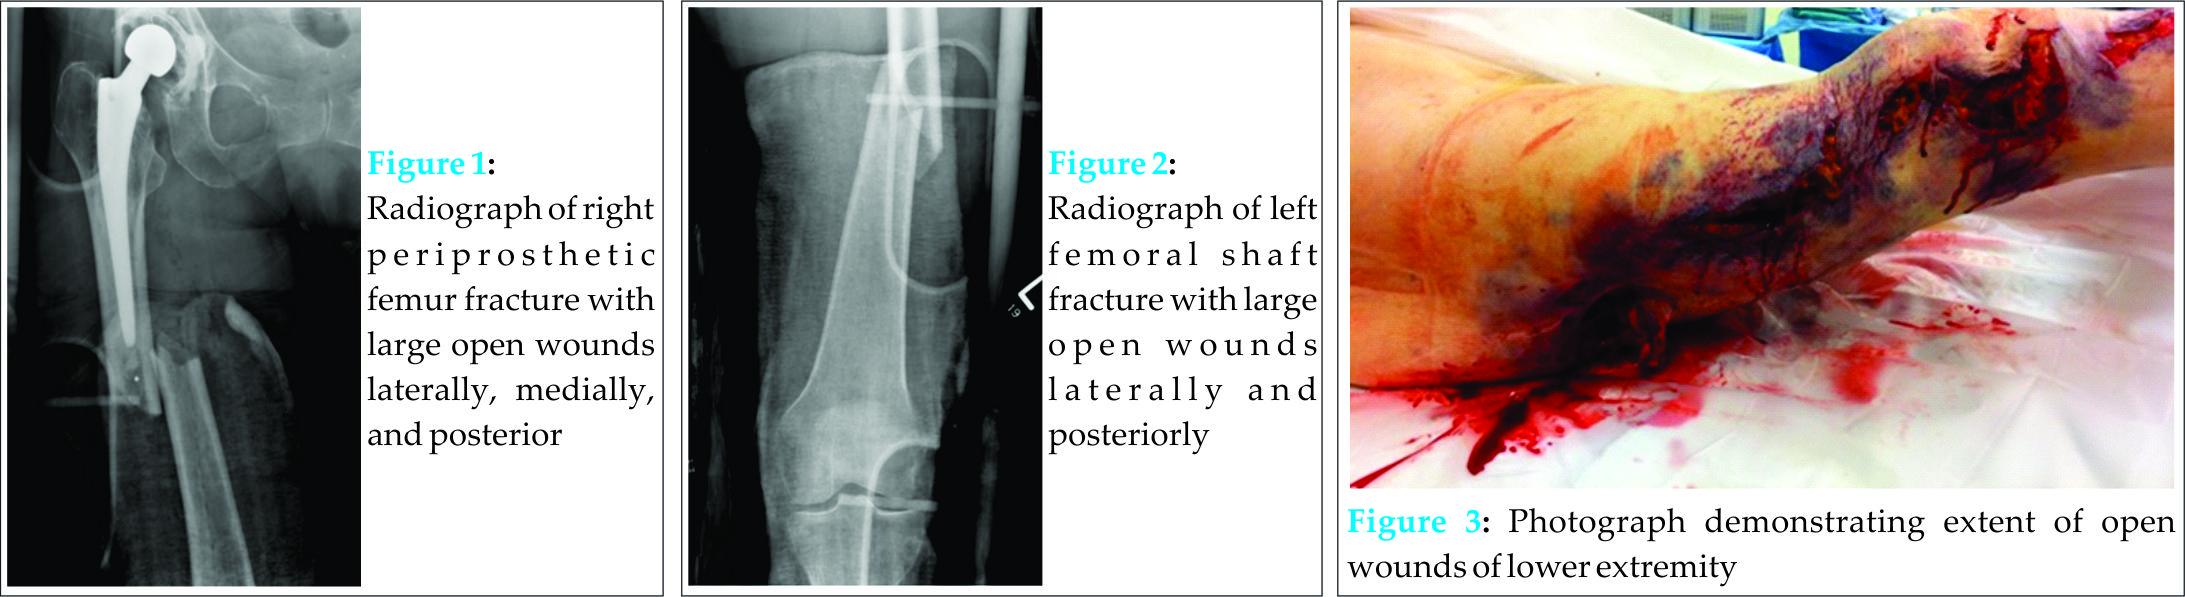 bilateral femoral fractures essay